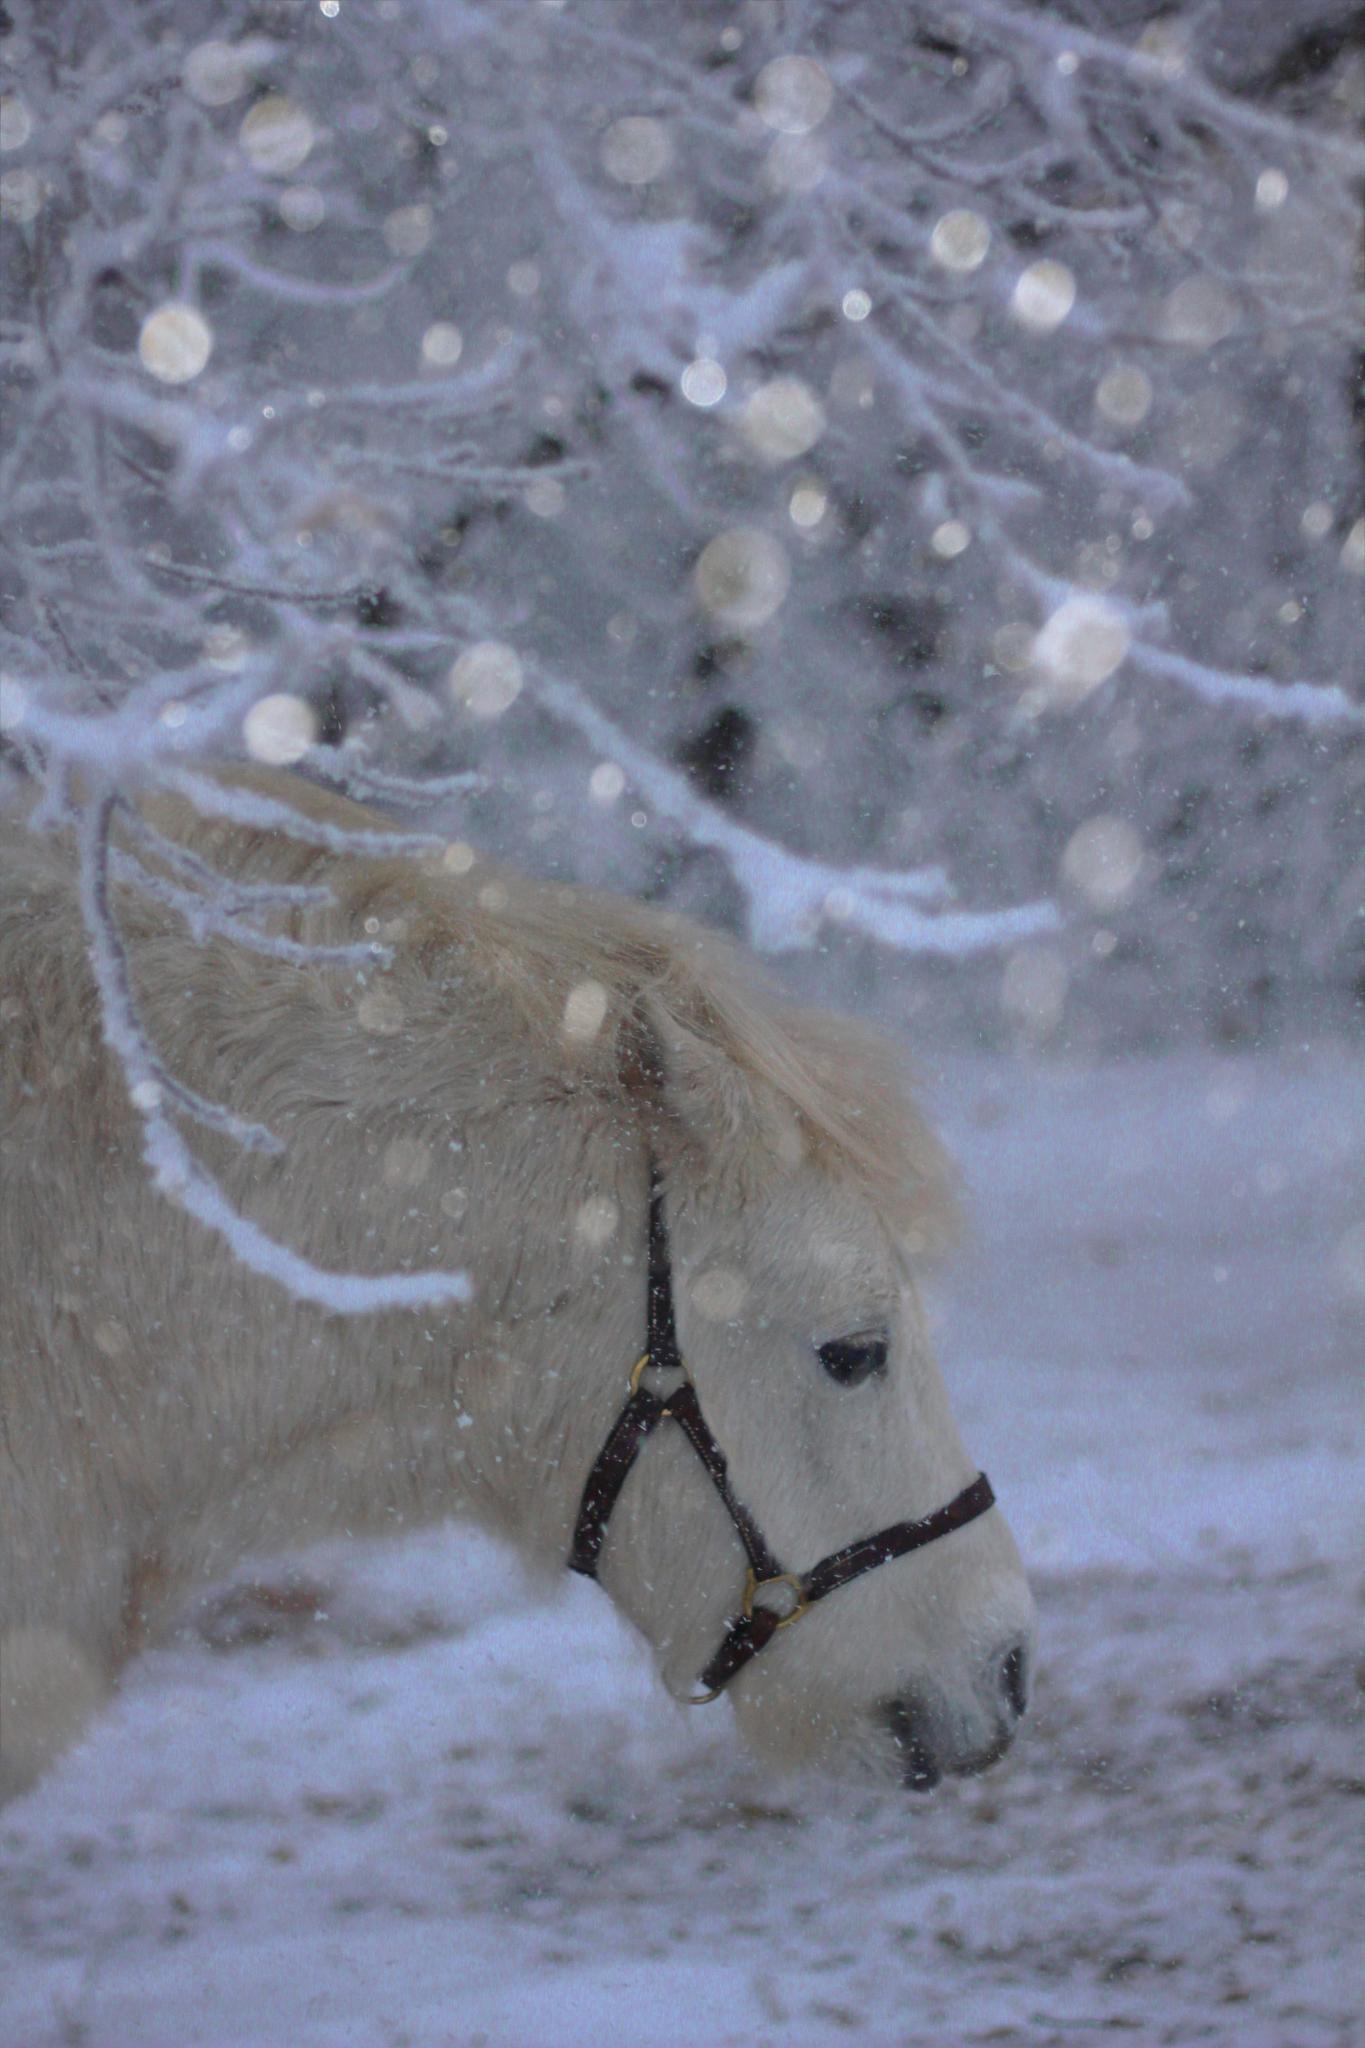 Winter Wonderland by nancy.makowecki